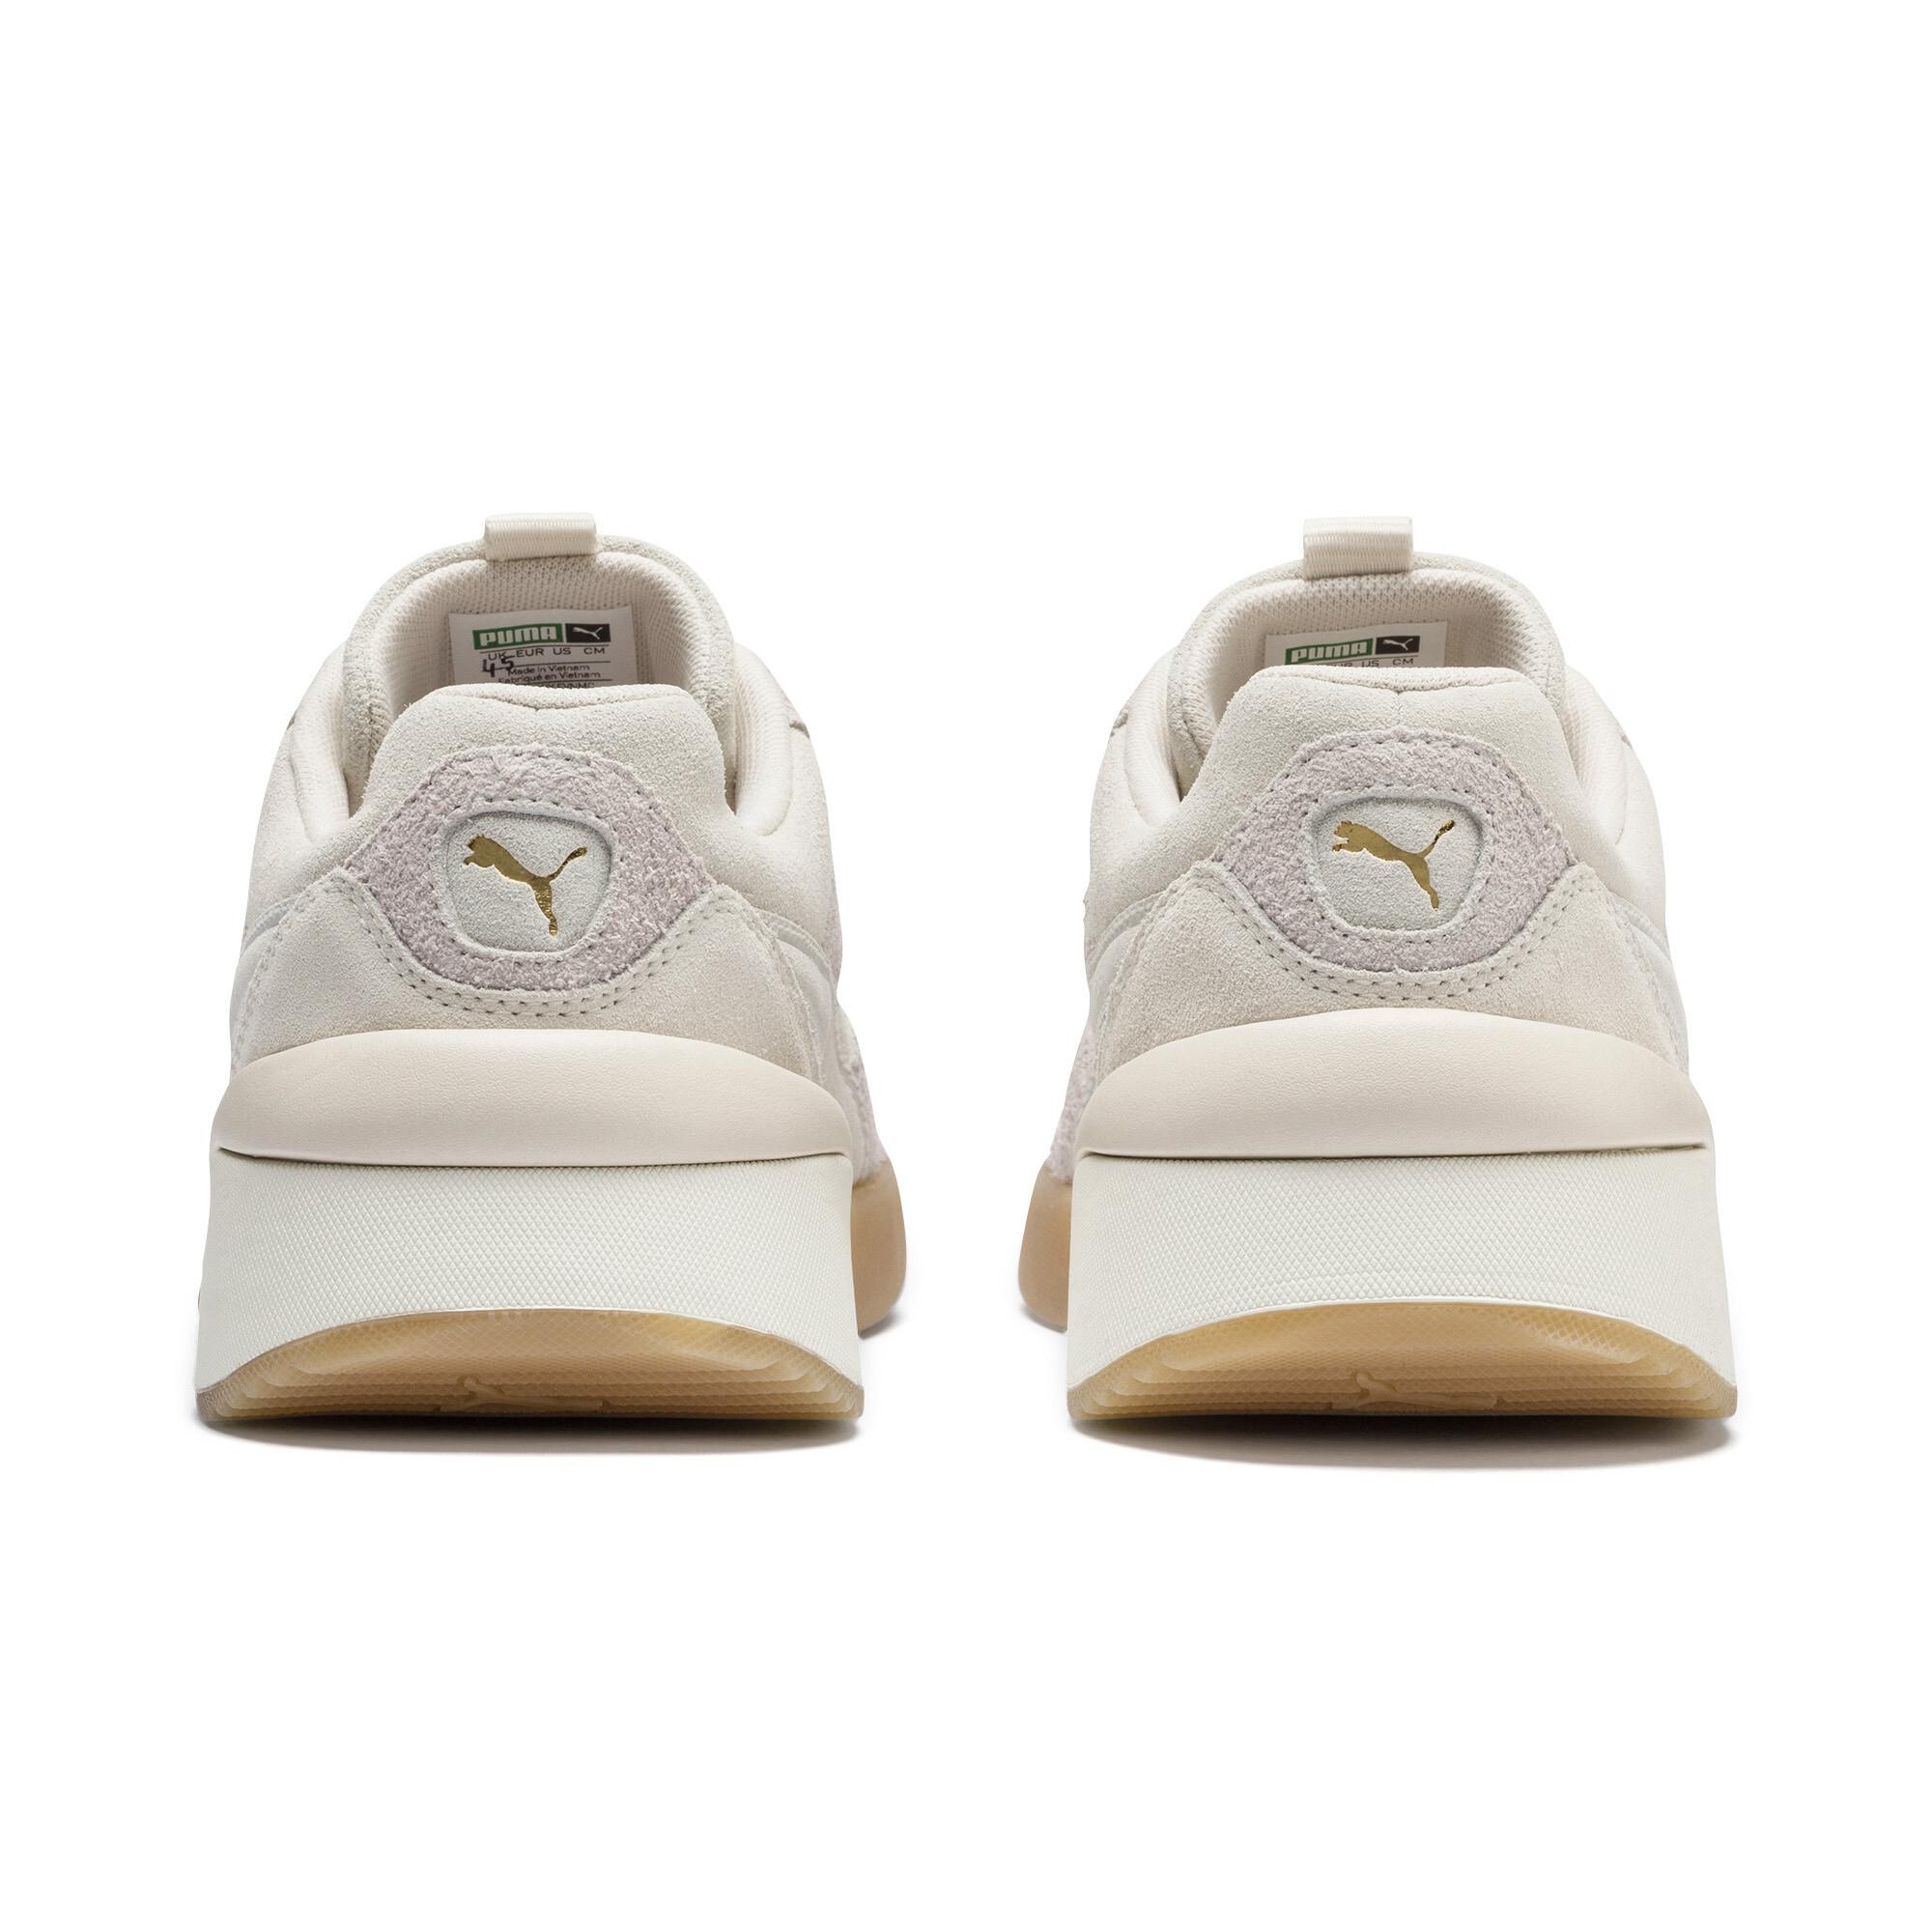 PUMA-Women-039-s-Aeon-Rewind-Sneakers thumbnail 3